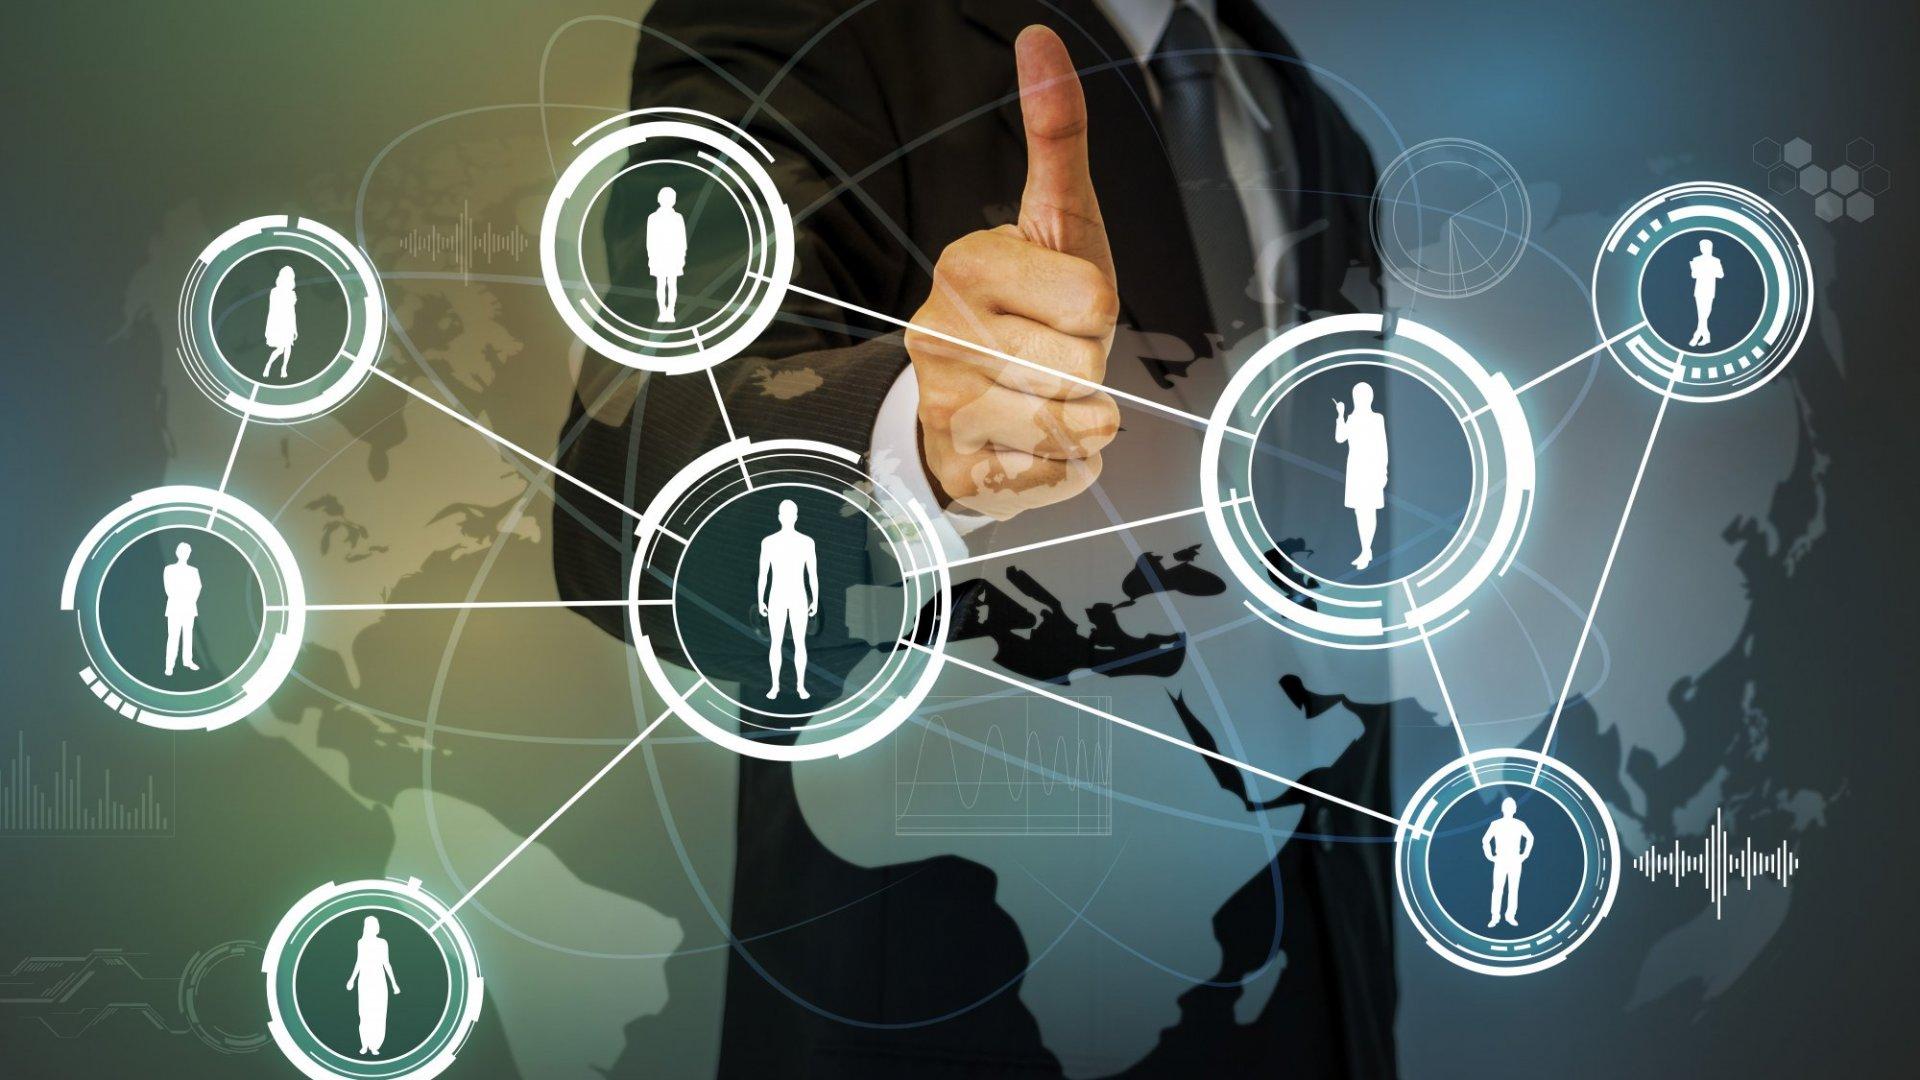 The 4 Key Differentiators Between CEO Peer Groups